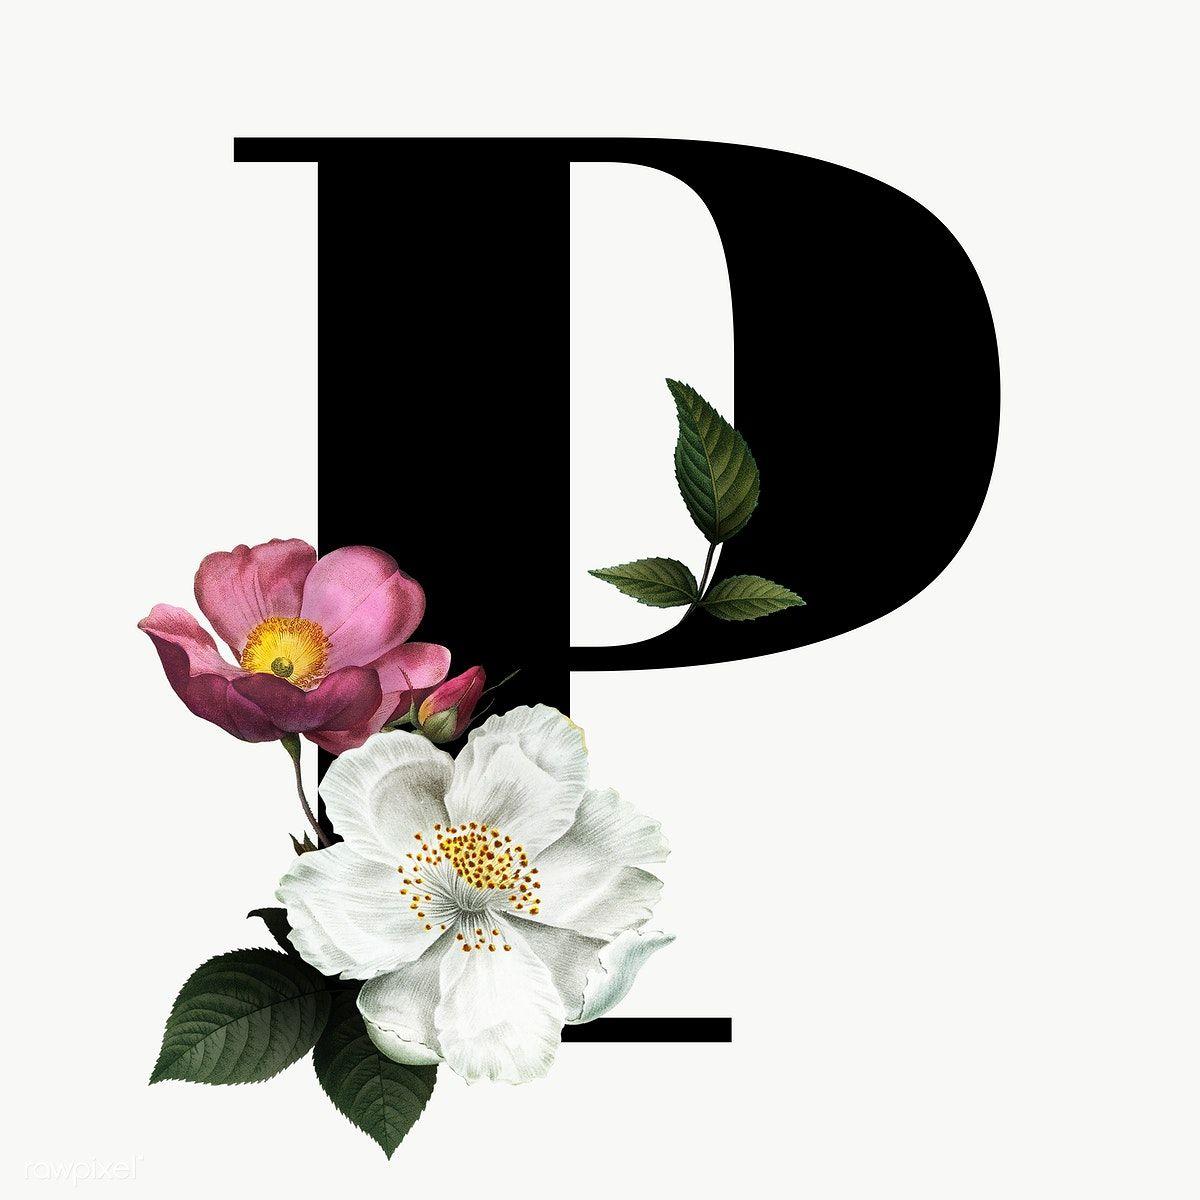 Classic And Elegant Floral Alphabet Font Letter P Transparent Png Free Image By Rawpixel Com Manota Lettering Alphabet Fonts Fonts Alphabet Lettering Fonts